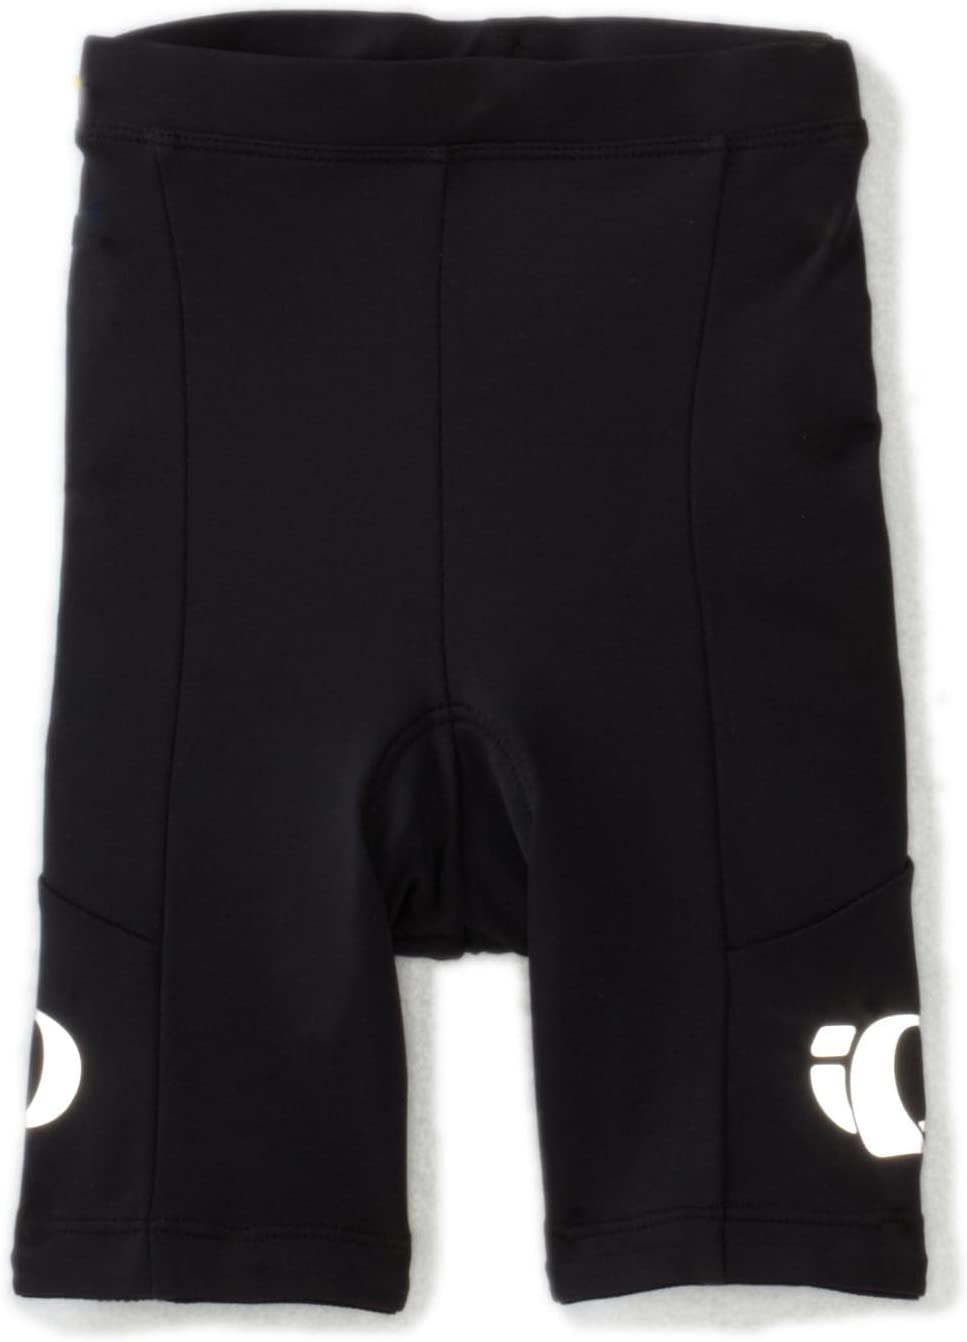 PEARL IZUMI Junior Tri-Shorts